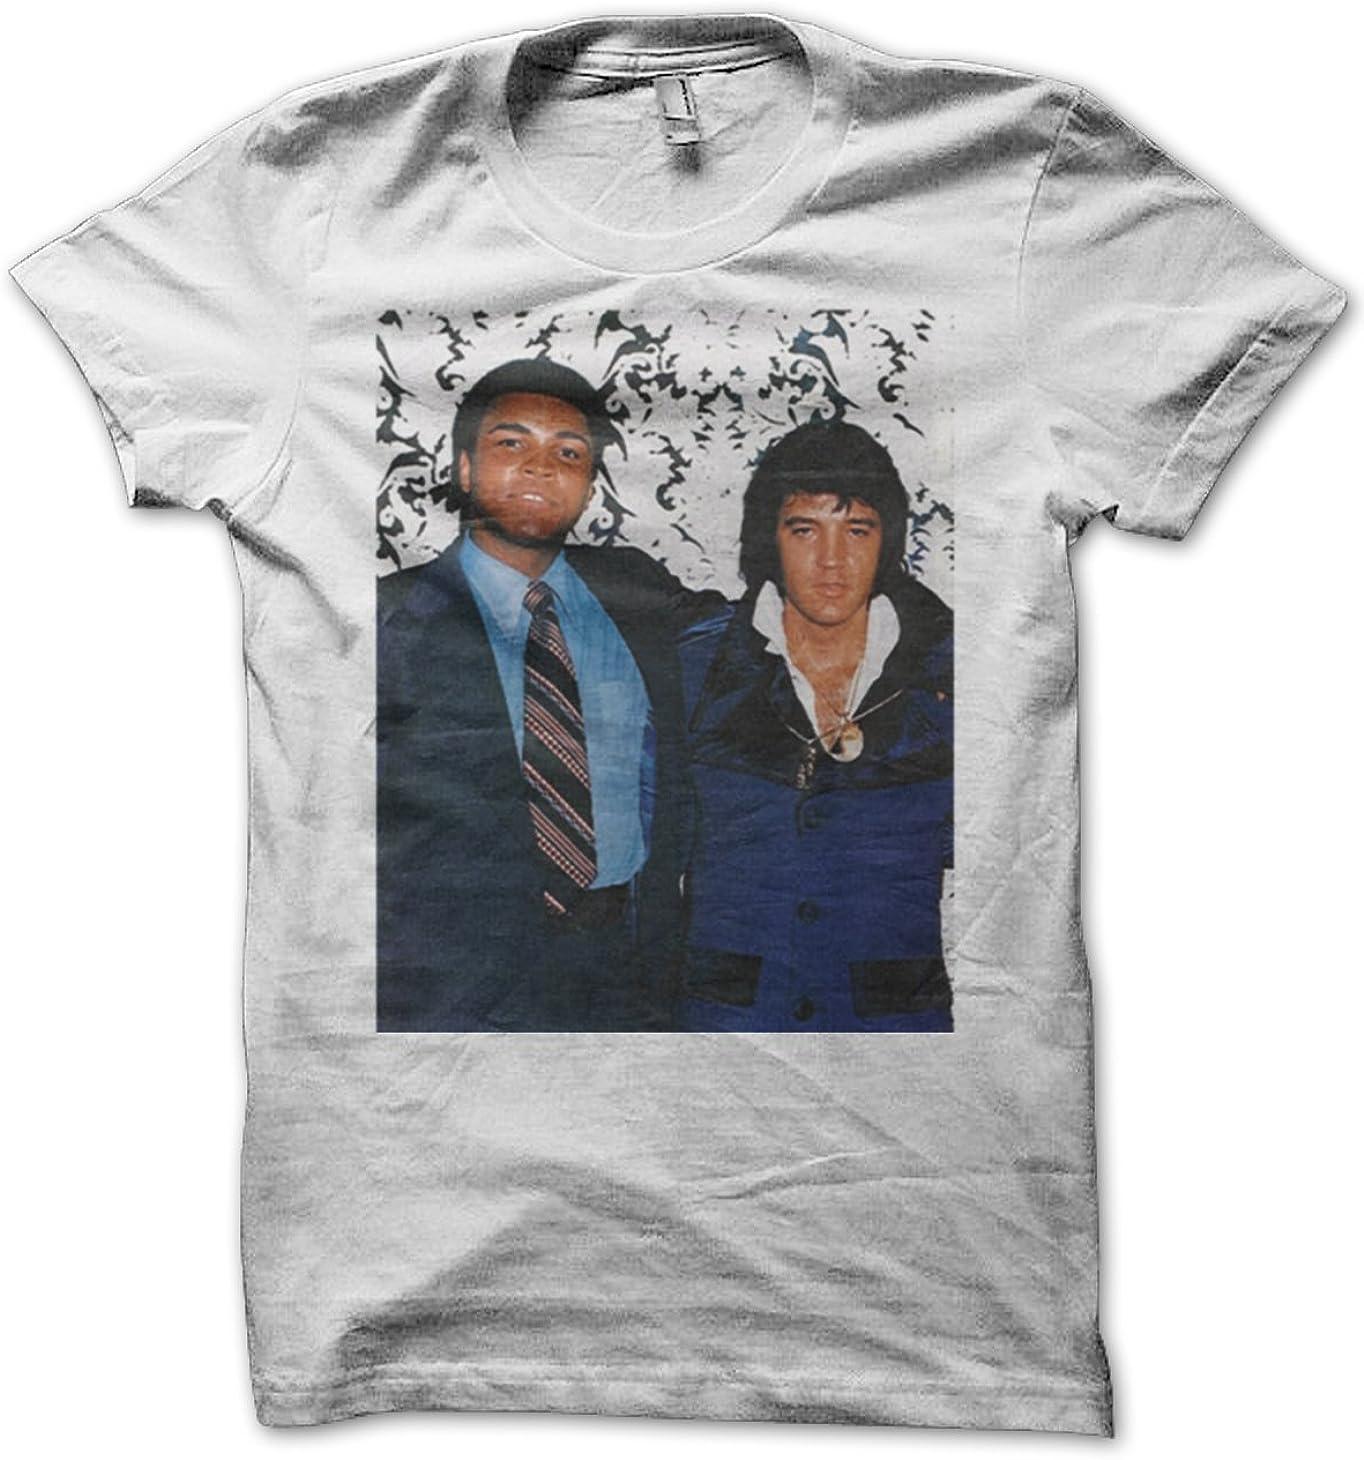 Ali and Elvis - Camiseta blanca para hombre